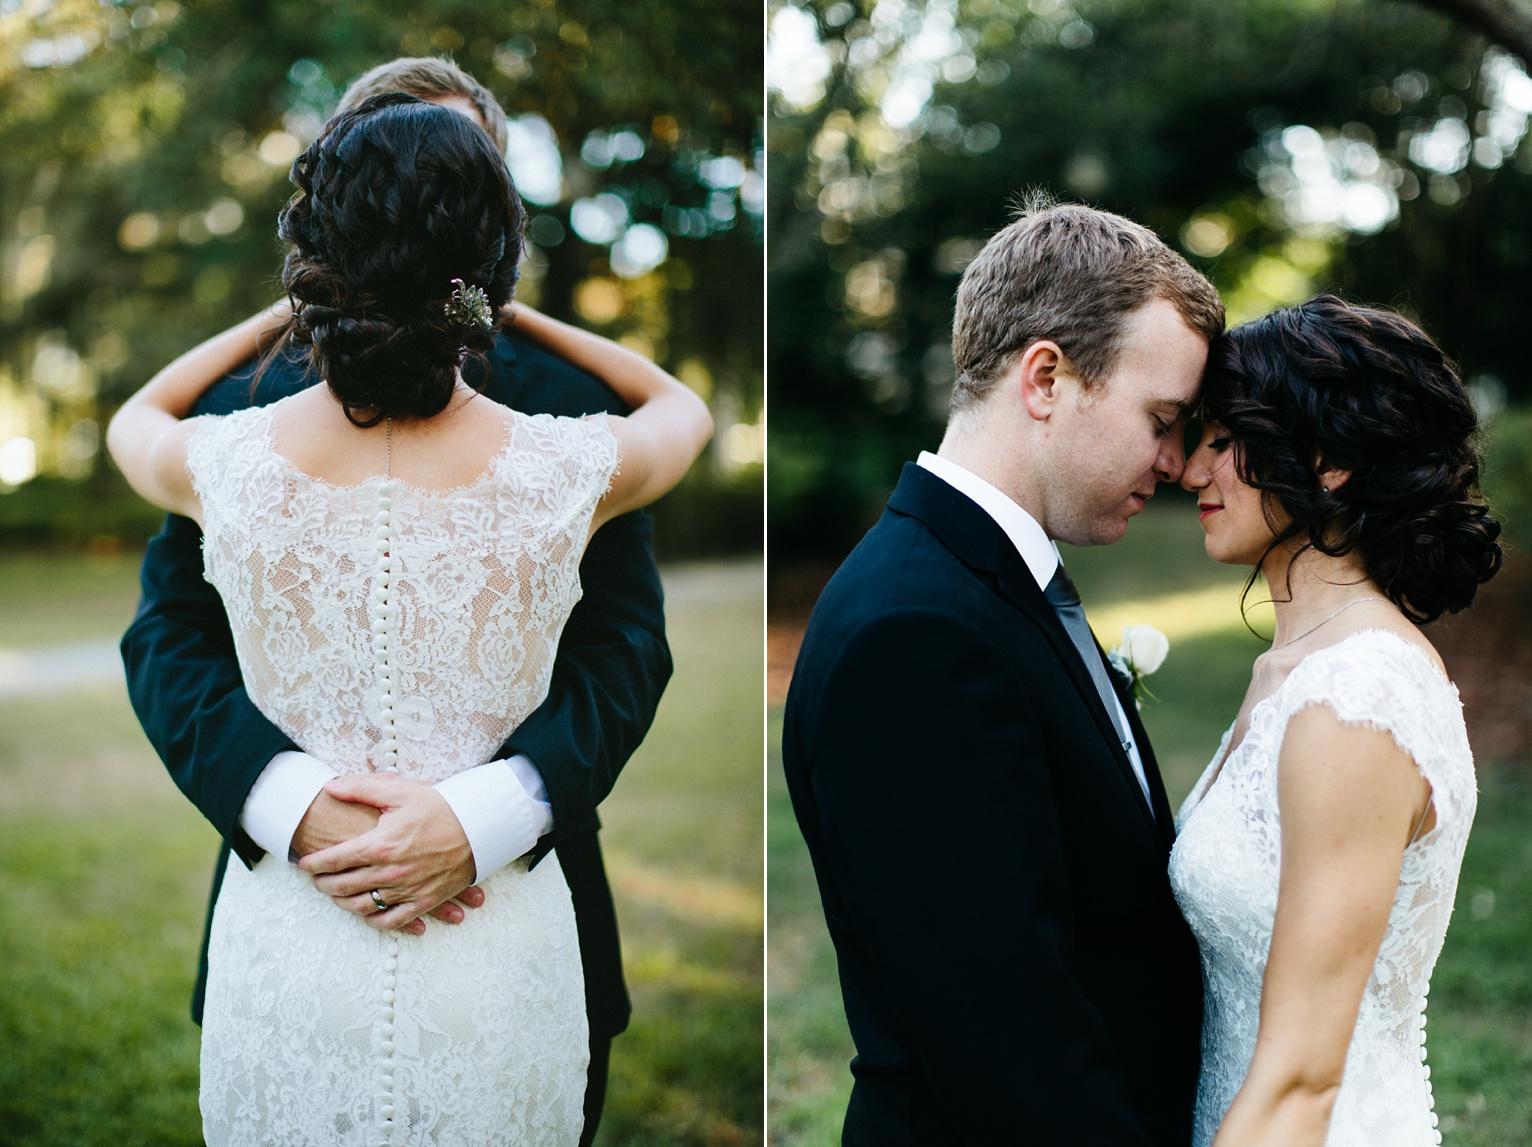 Dreamtownco.com_blog_Stephen&Carly_Wedding_0049.jpg